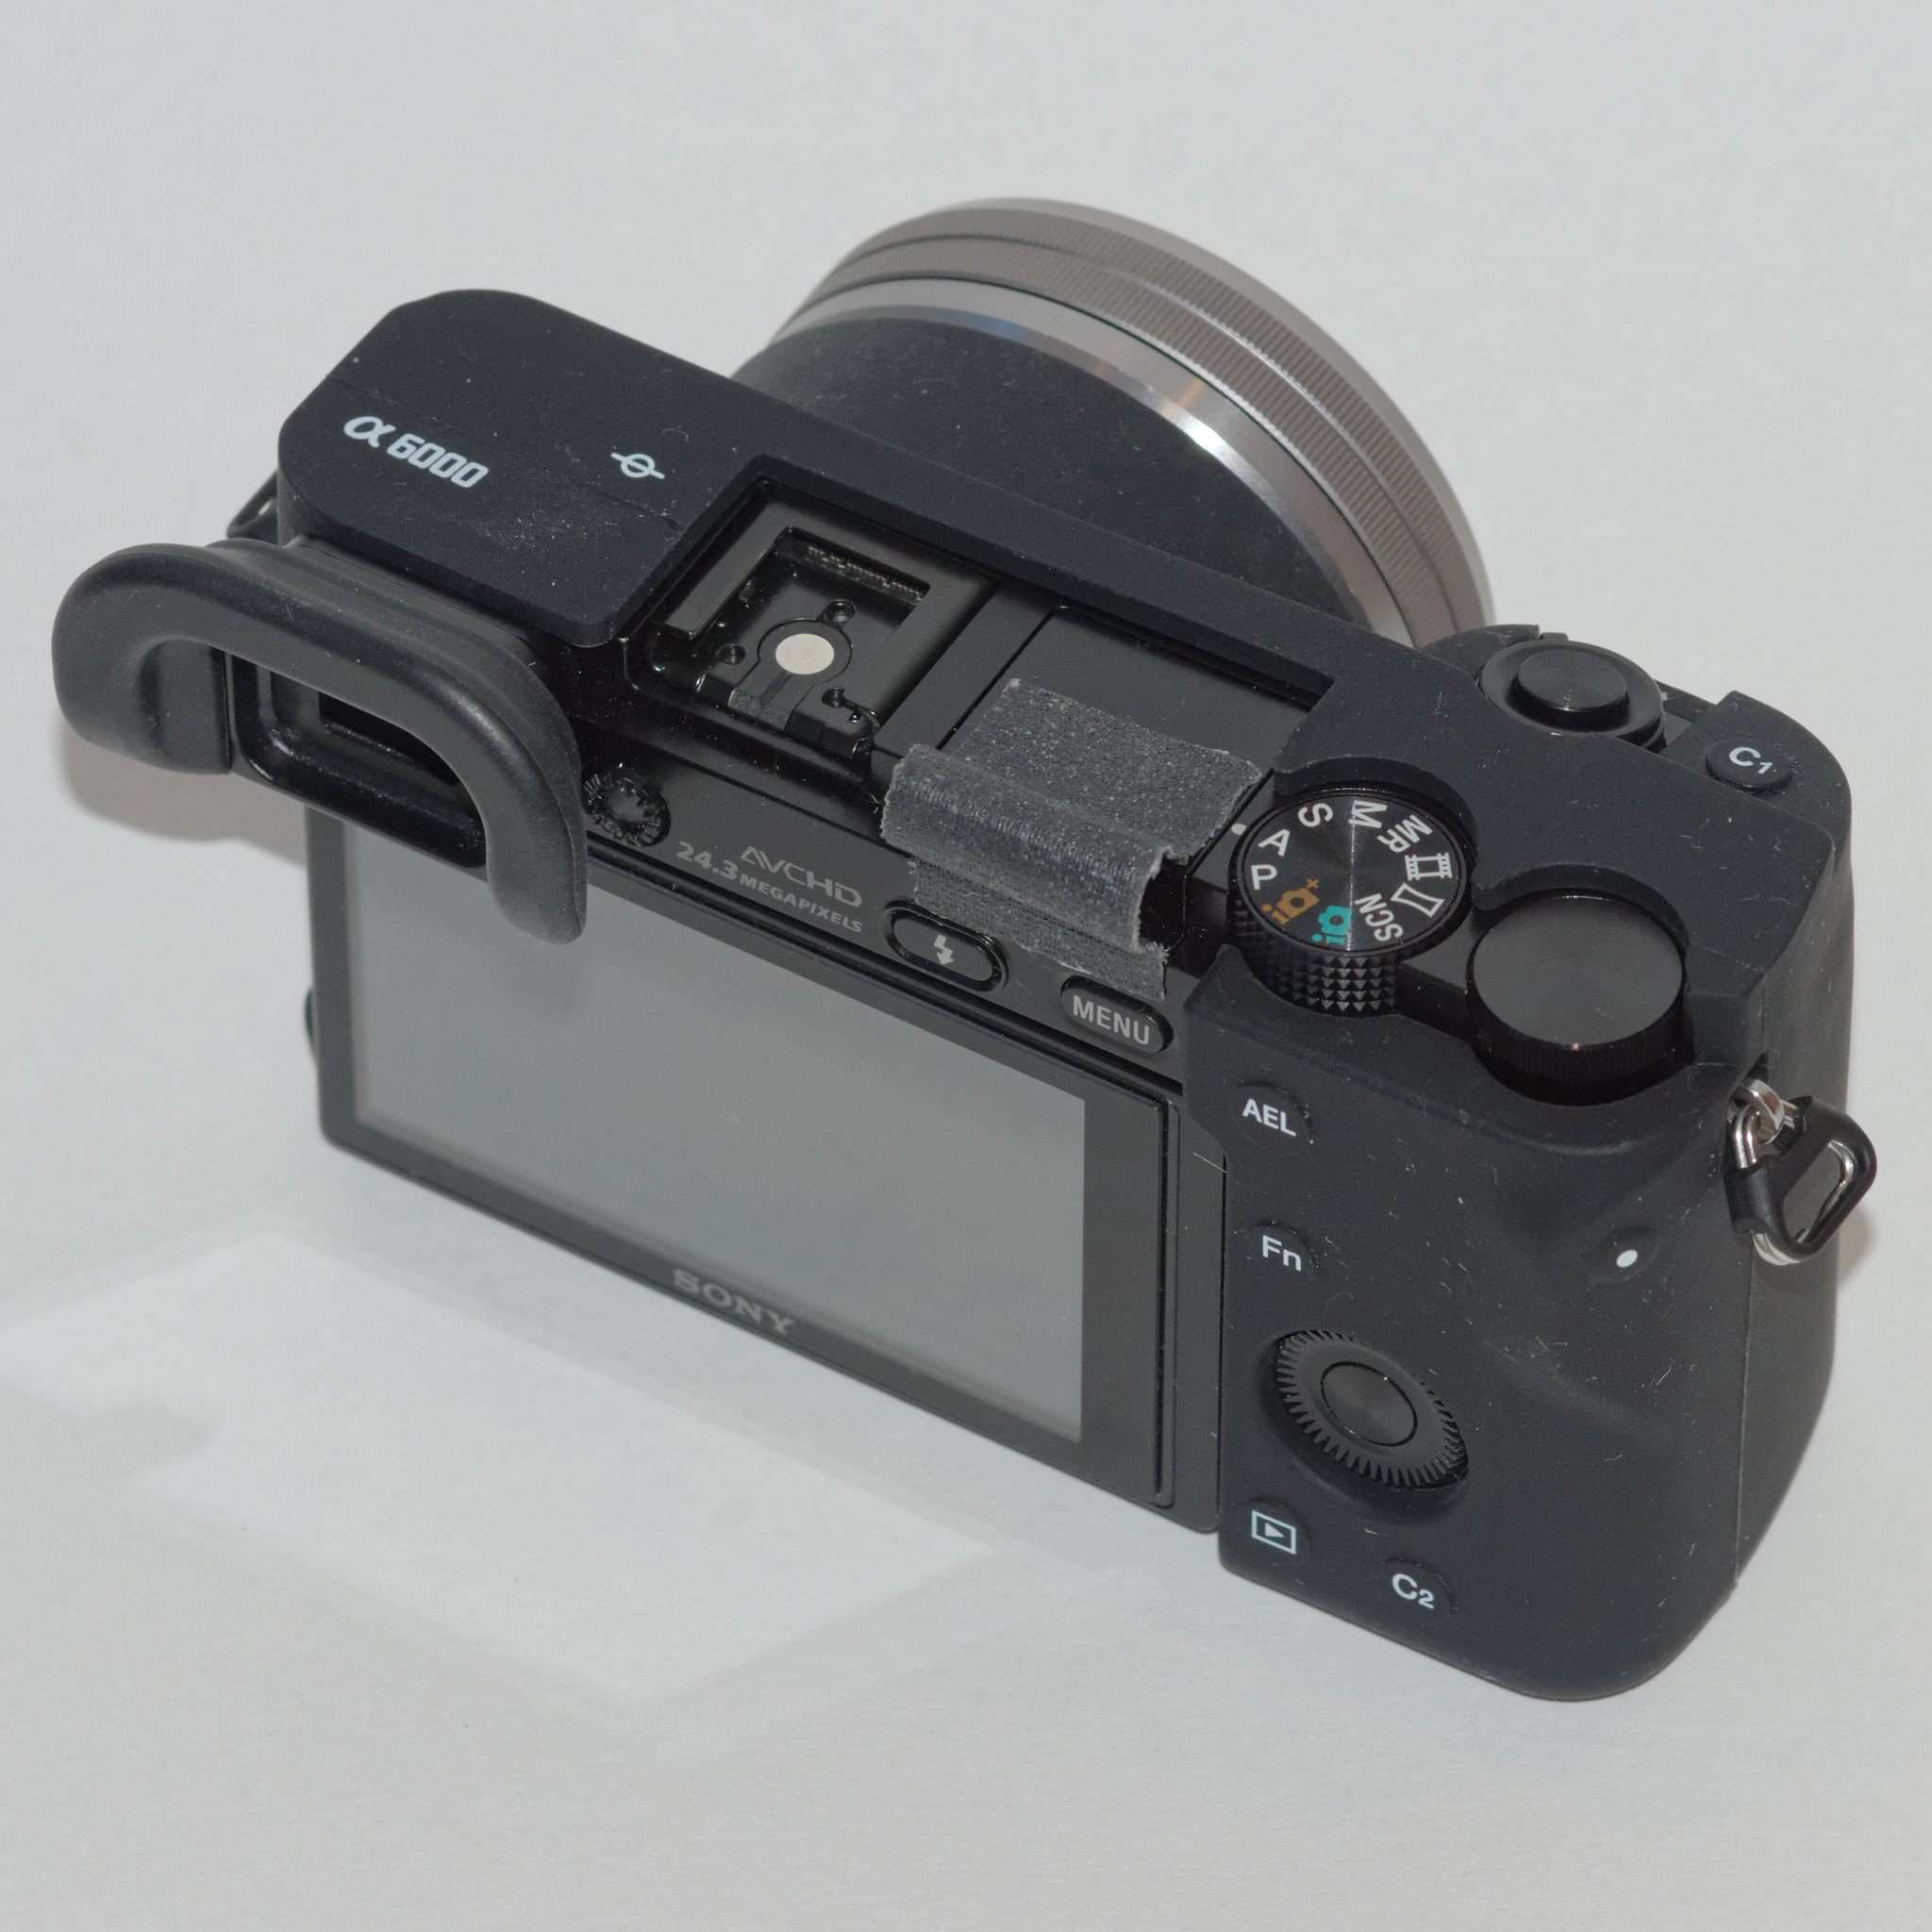 High Original Size Need Very Small Sony Alpha Nex Talk Sony A6000 Buy Bundle Sony A6000 Buy Canada dpreview Sony A6000 Best Buy